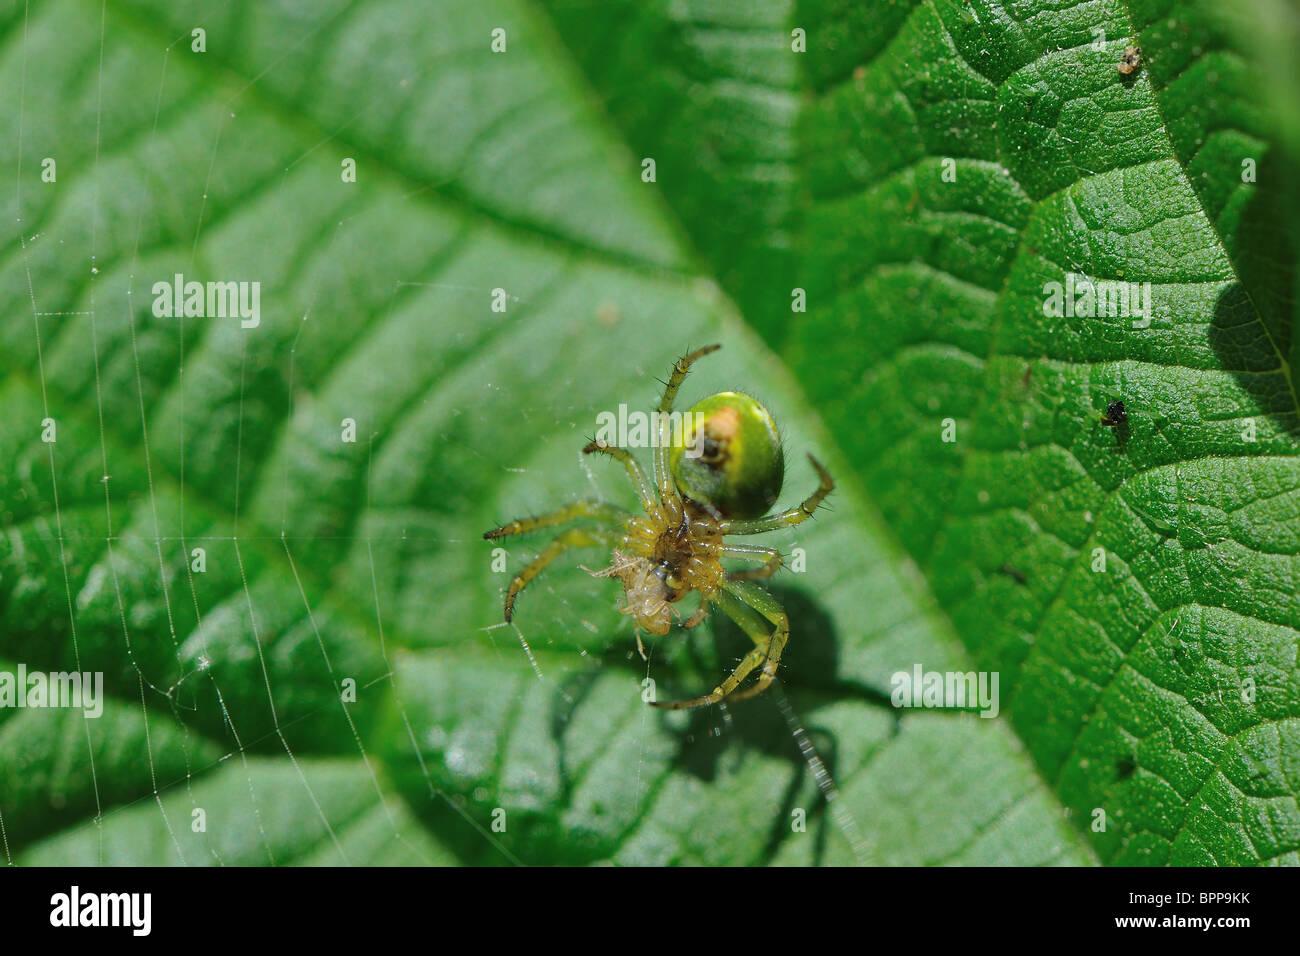 Cucumber spider - Cucumber green spider (Araniella cucurbitina) eating a prey - Stock Image